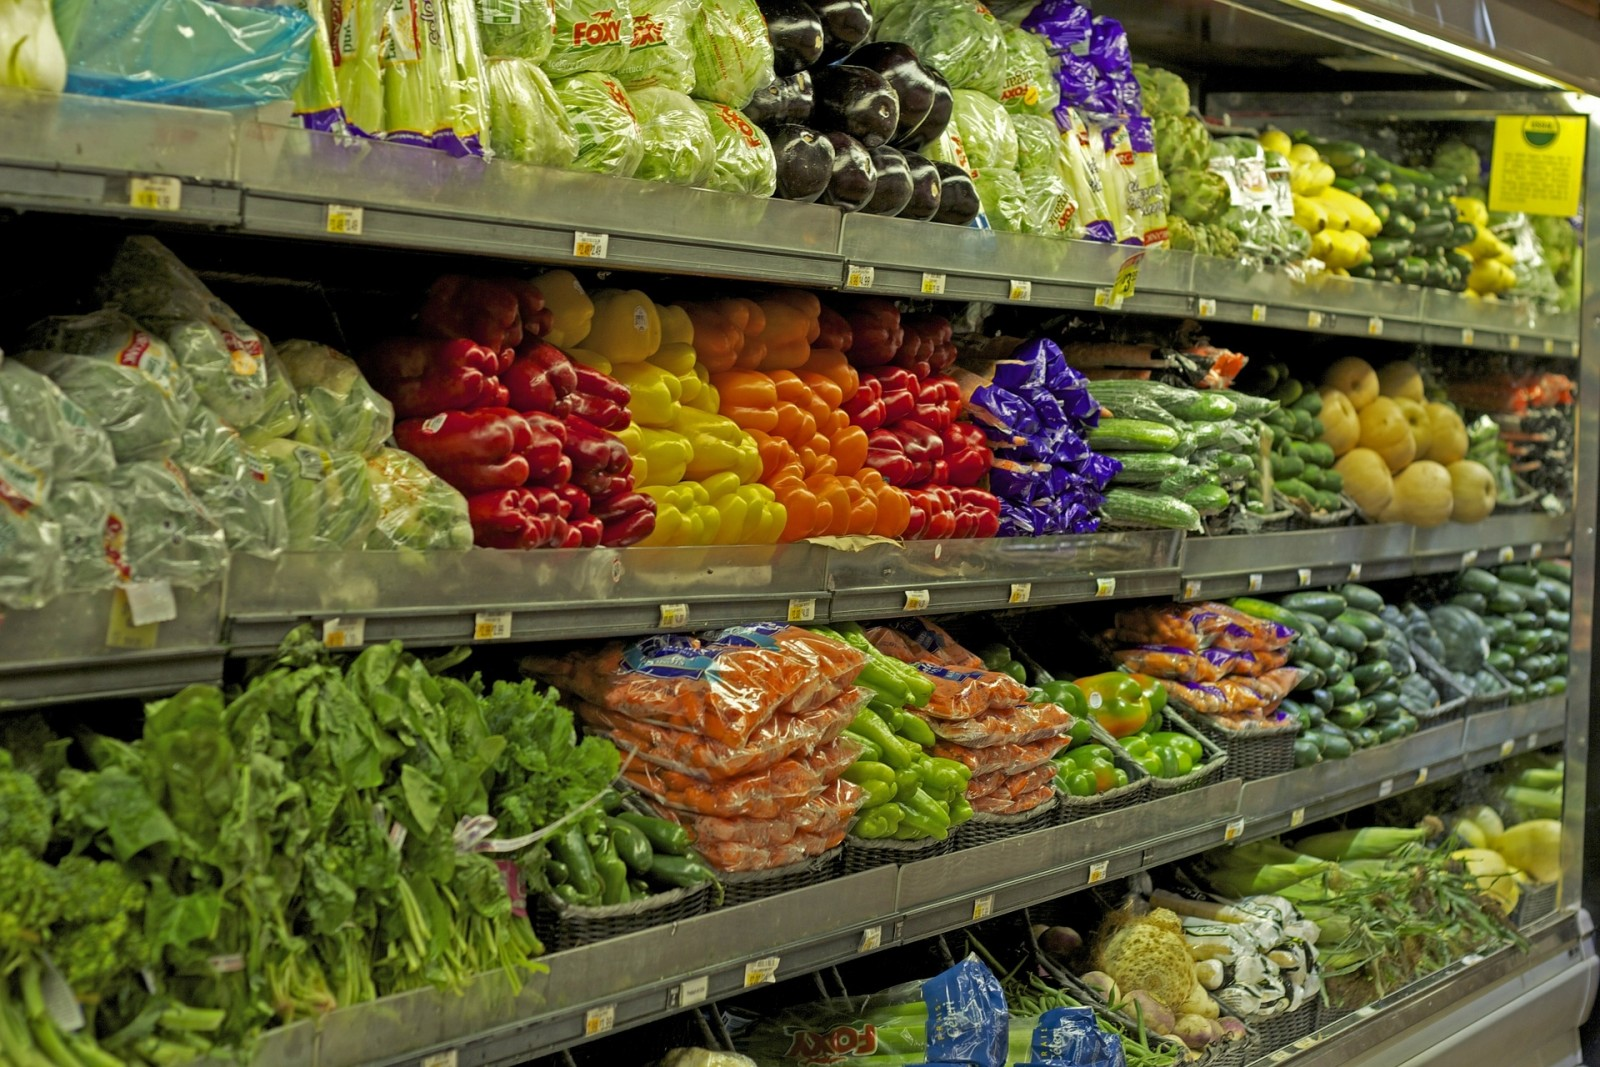 Vegetables (Photo courtesy of Pixabay)